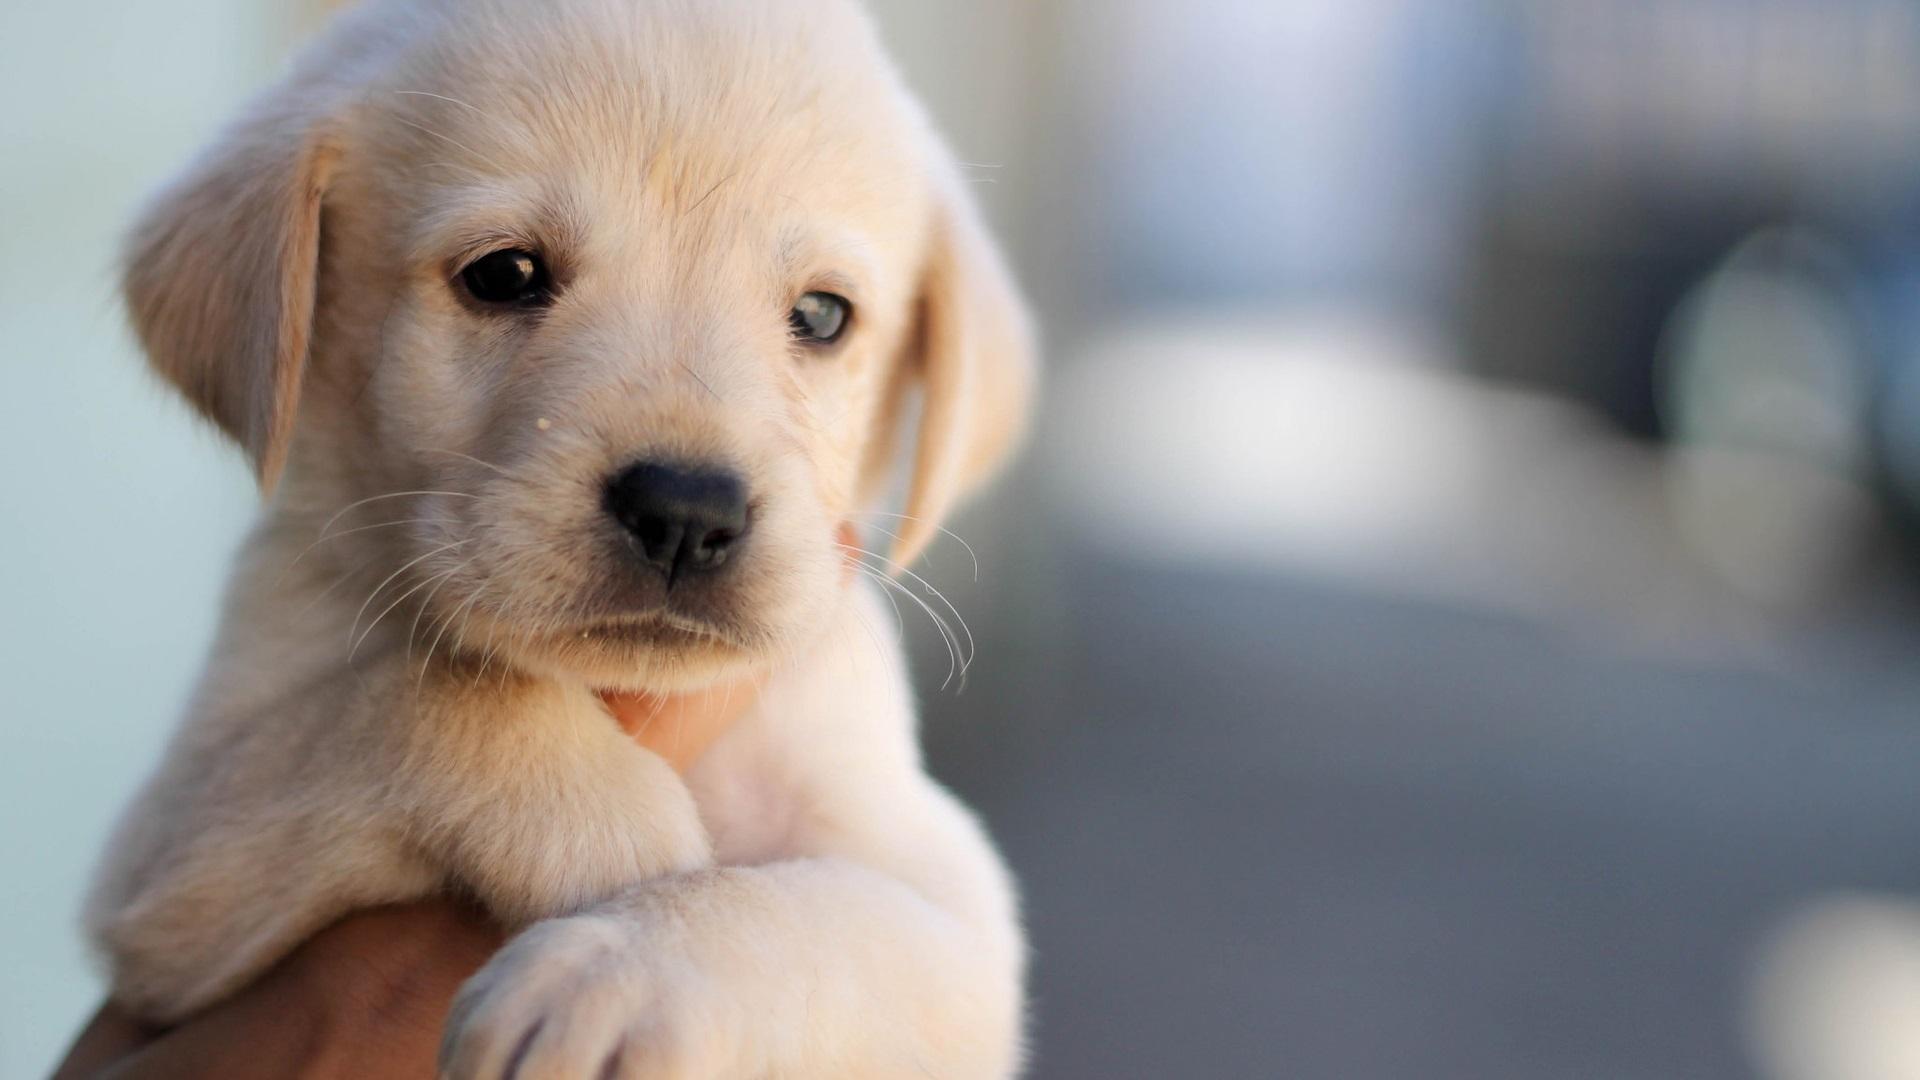 Cute Dog Images Hd Wallpapers Desktop Images Fidelity: 壁紙 かわいい子犬、犬、ペット、顔、手 1920x1200 HD 無料のデスクトップの背景, 画像